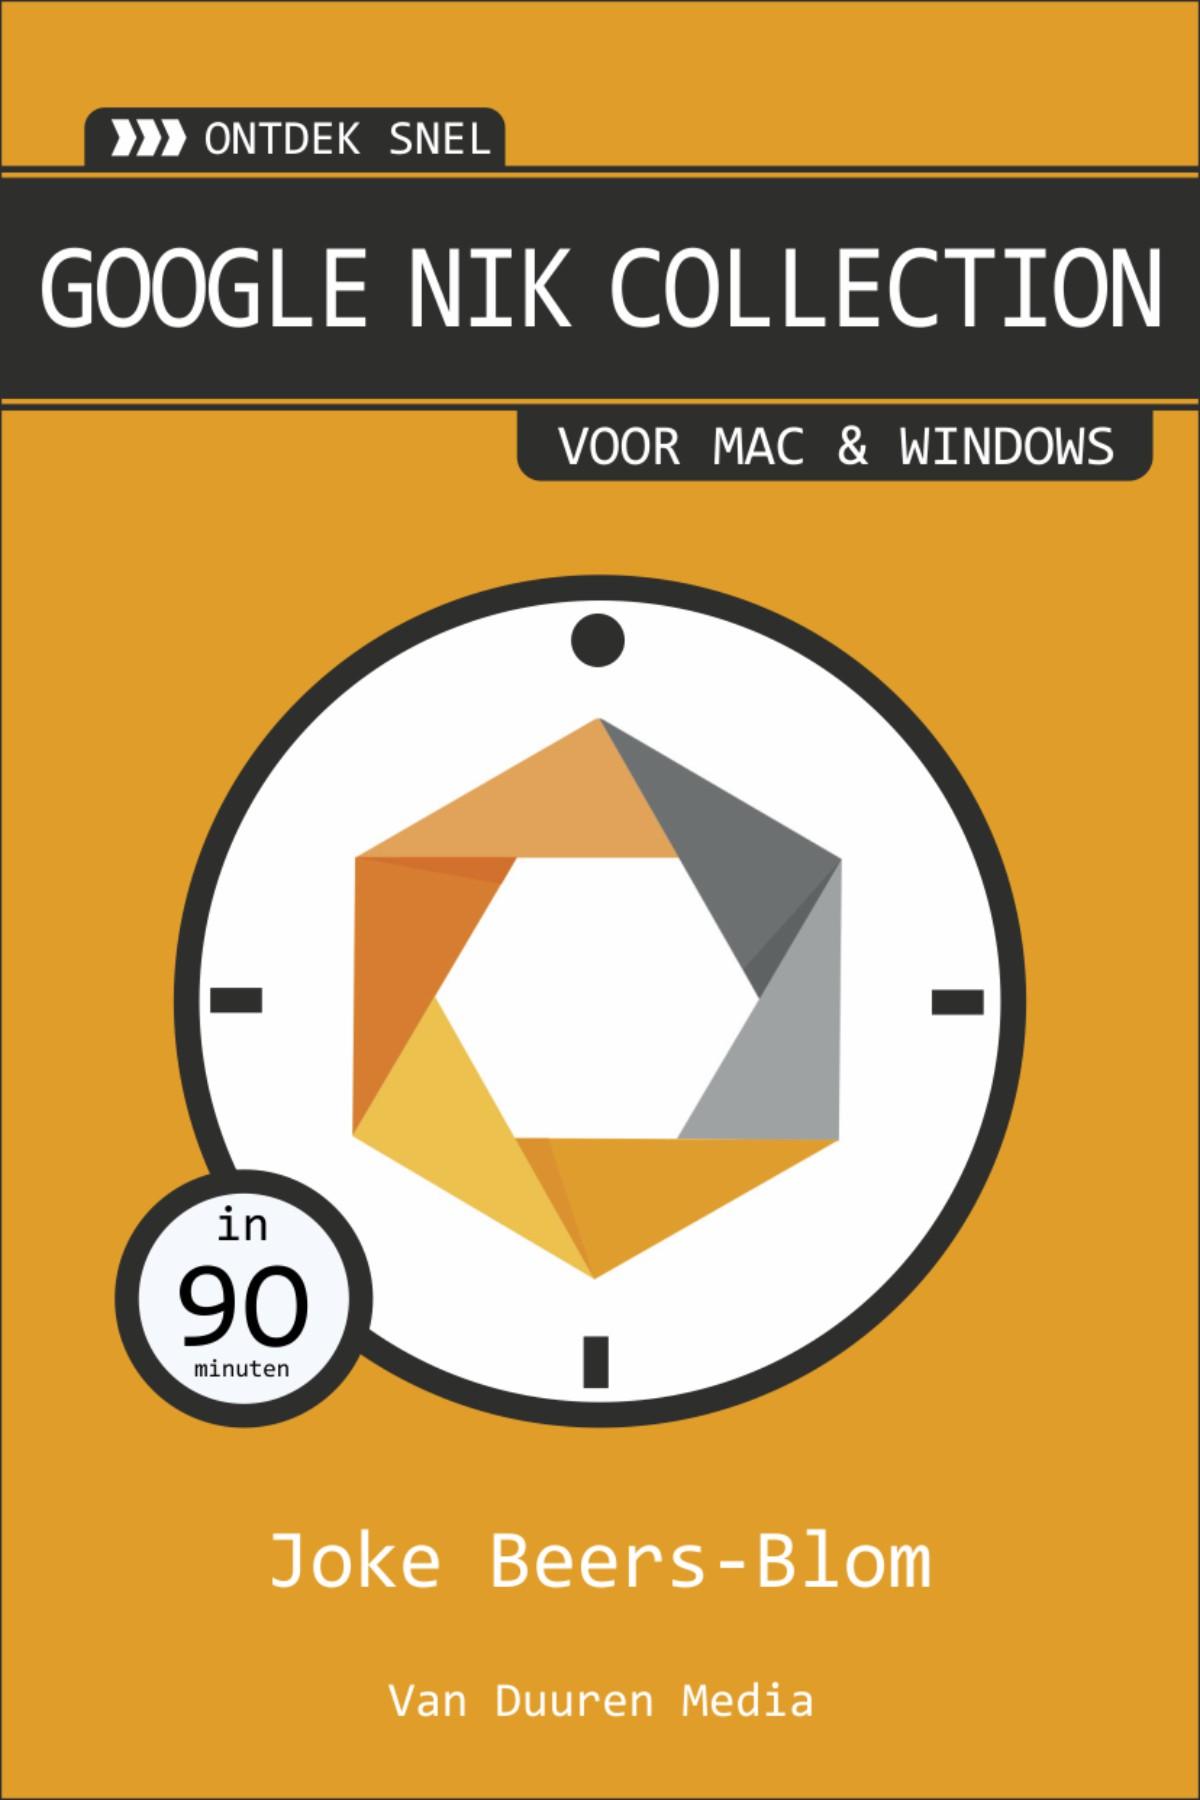 coverfoto Ontdek snel: Google Nik Collection- Joke Beers-Blom, isbn 9789059408005